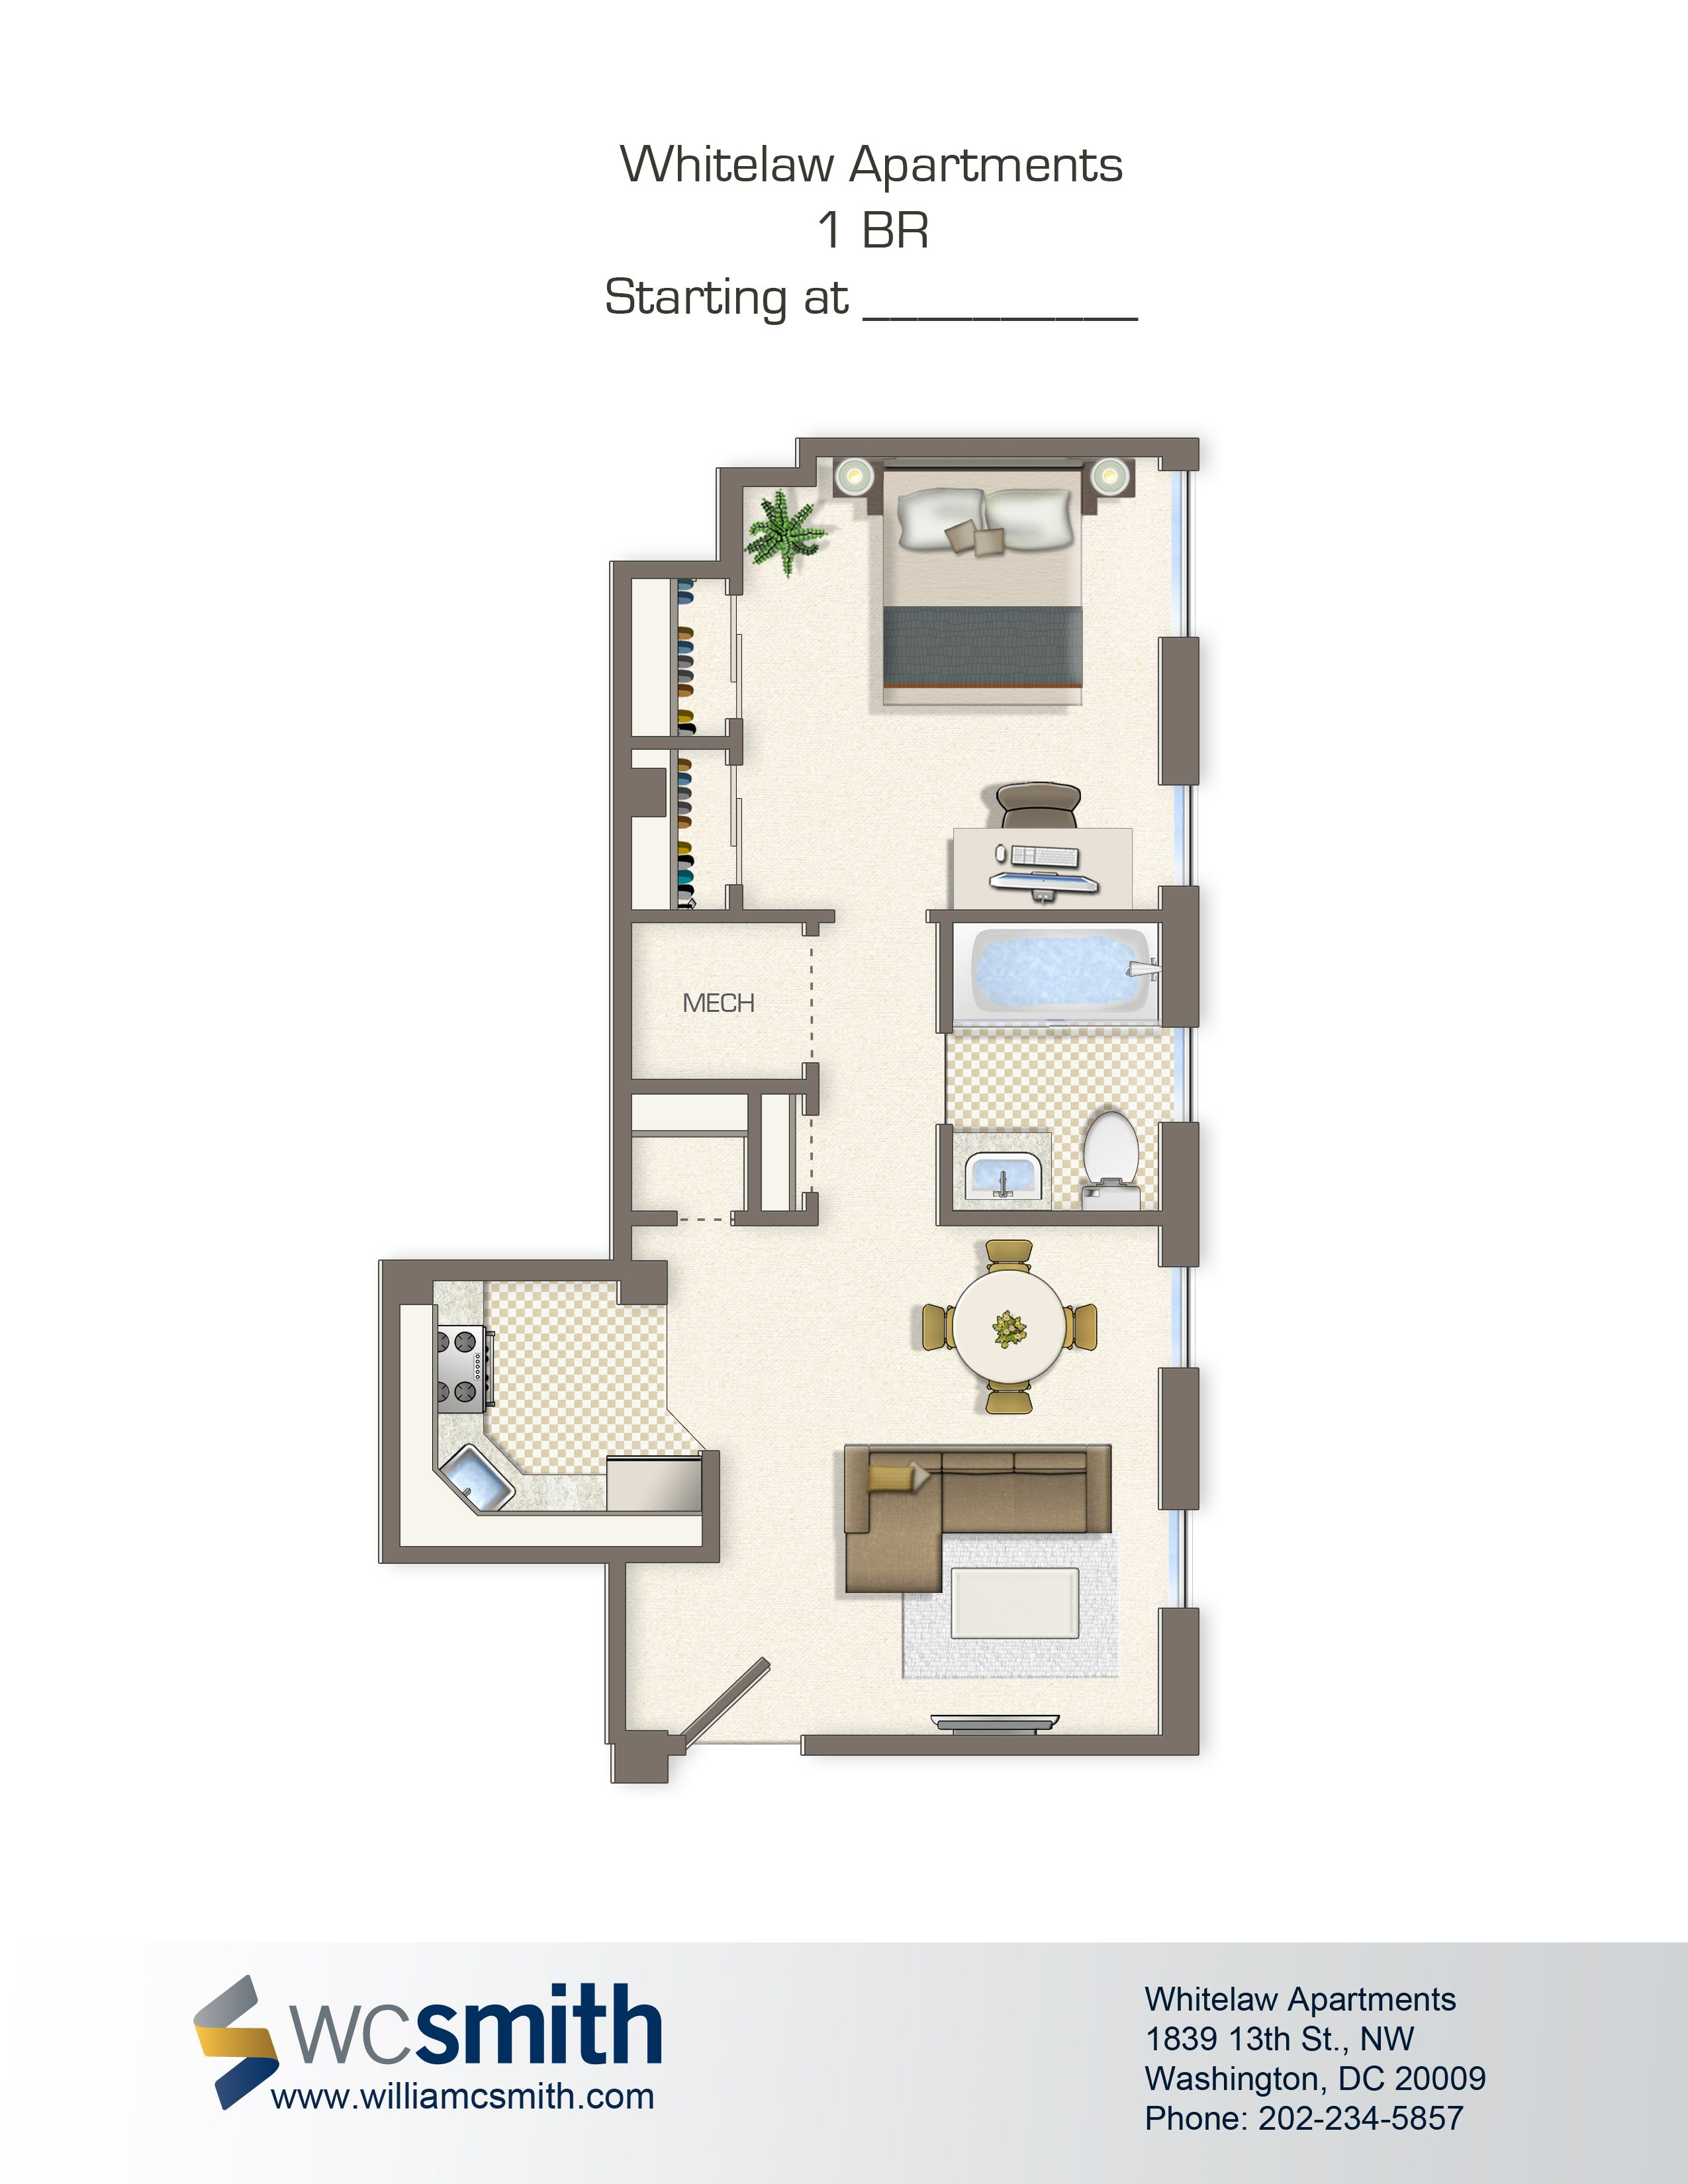 Whitelaw Wc Smith One Bedroom Apartment Apartment Bedroom Design Bedroom Apartment